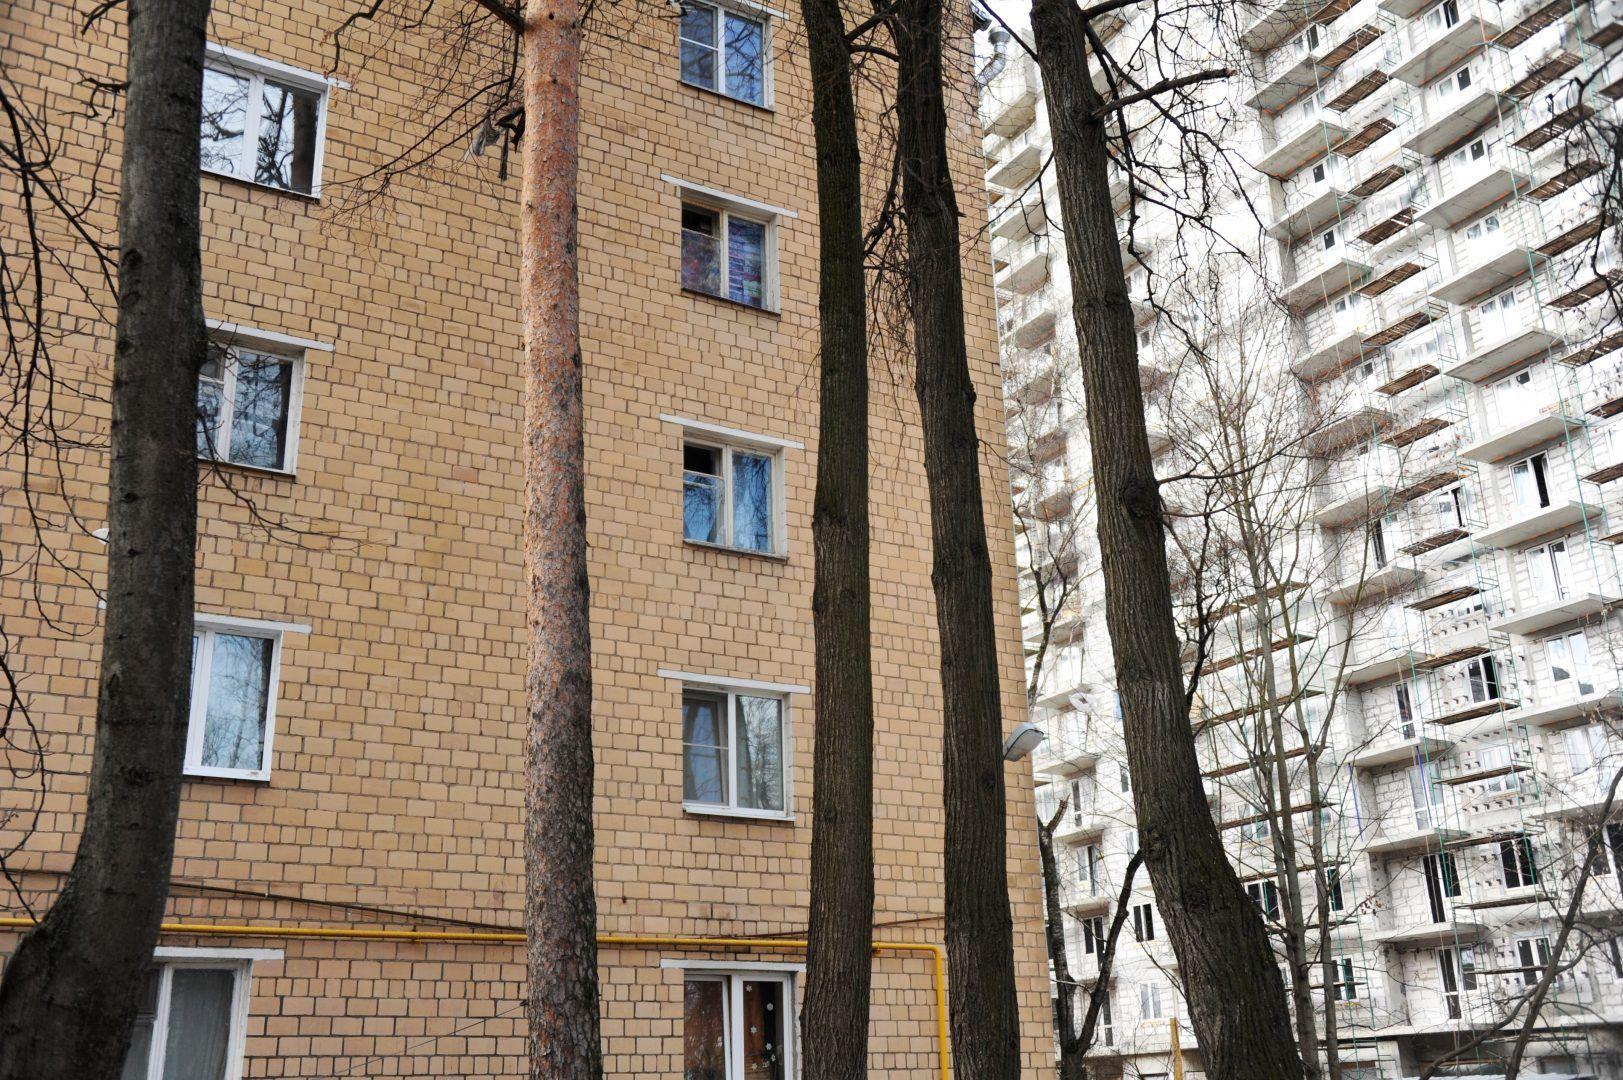 Жилые дома в Мосрентгене подготовят к весне. Фото: Светлана Колоскова, «Вечерняя Москва»